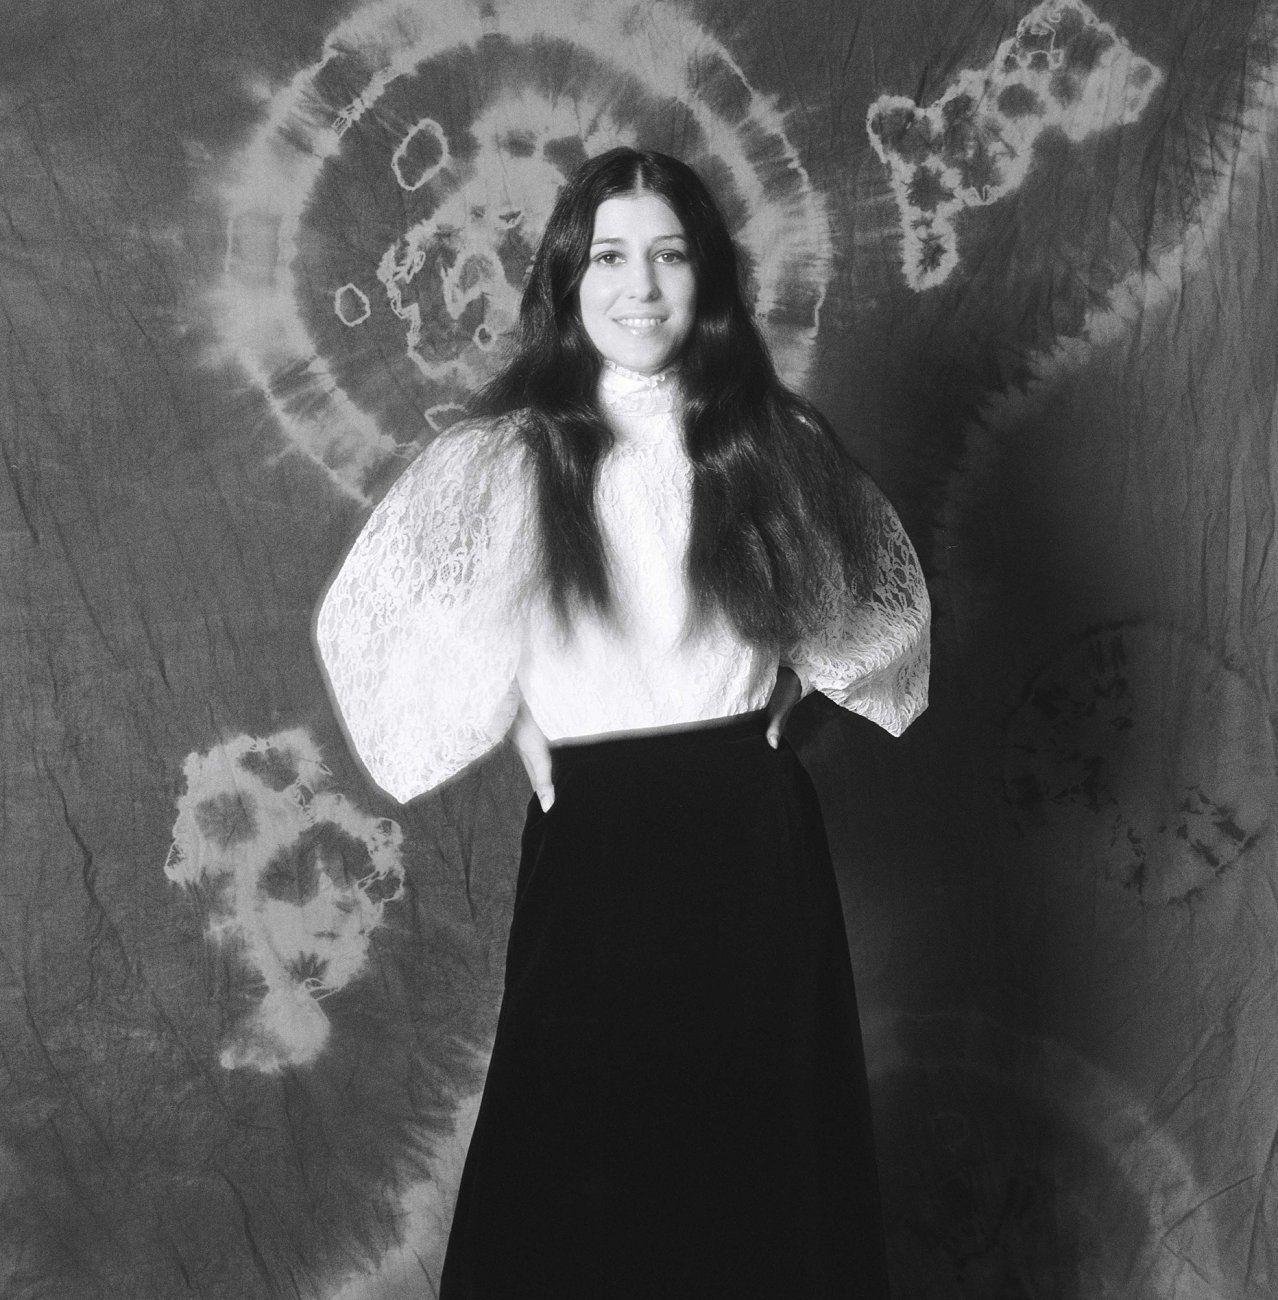 Rita Coolidge Getty Jim McCrary circa 70s.jpg (1278×1300)